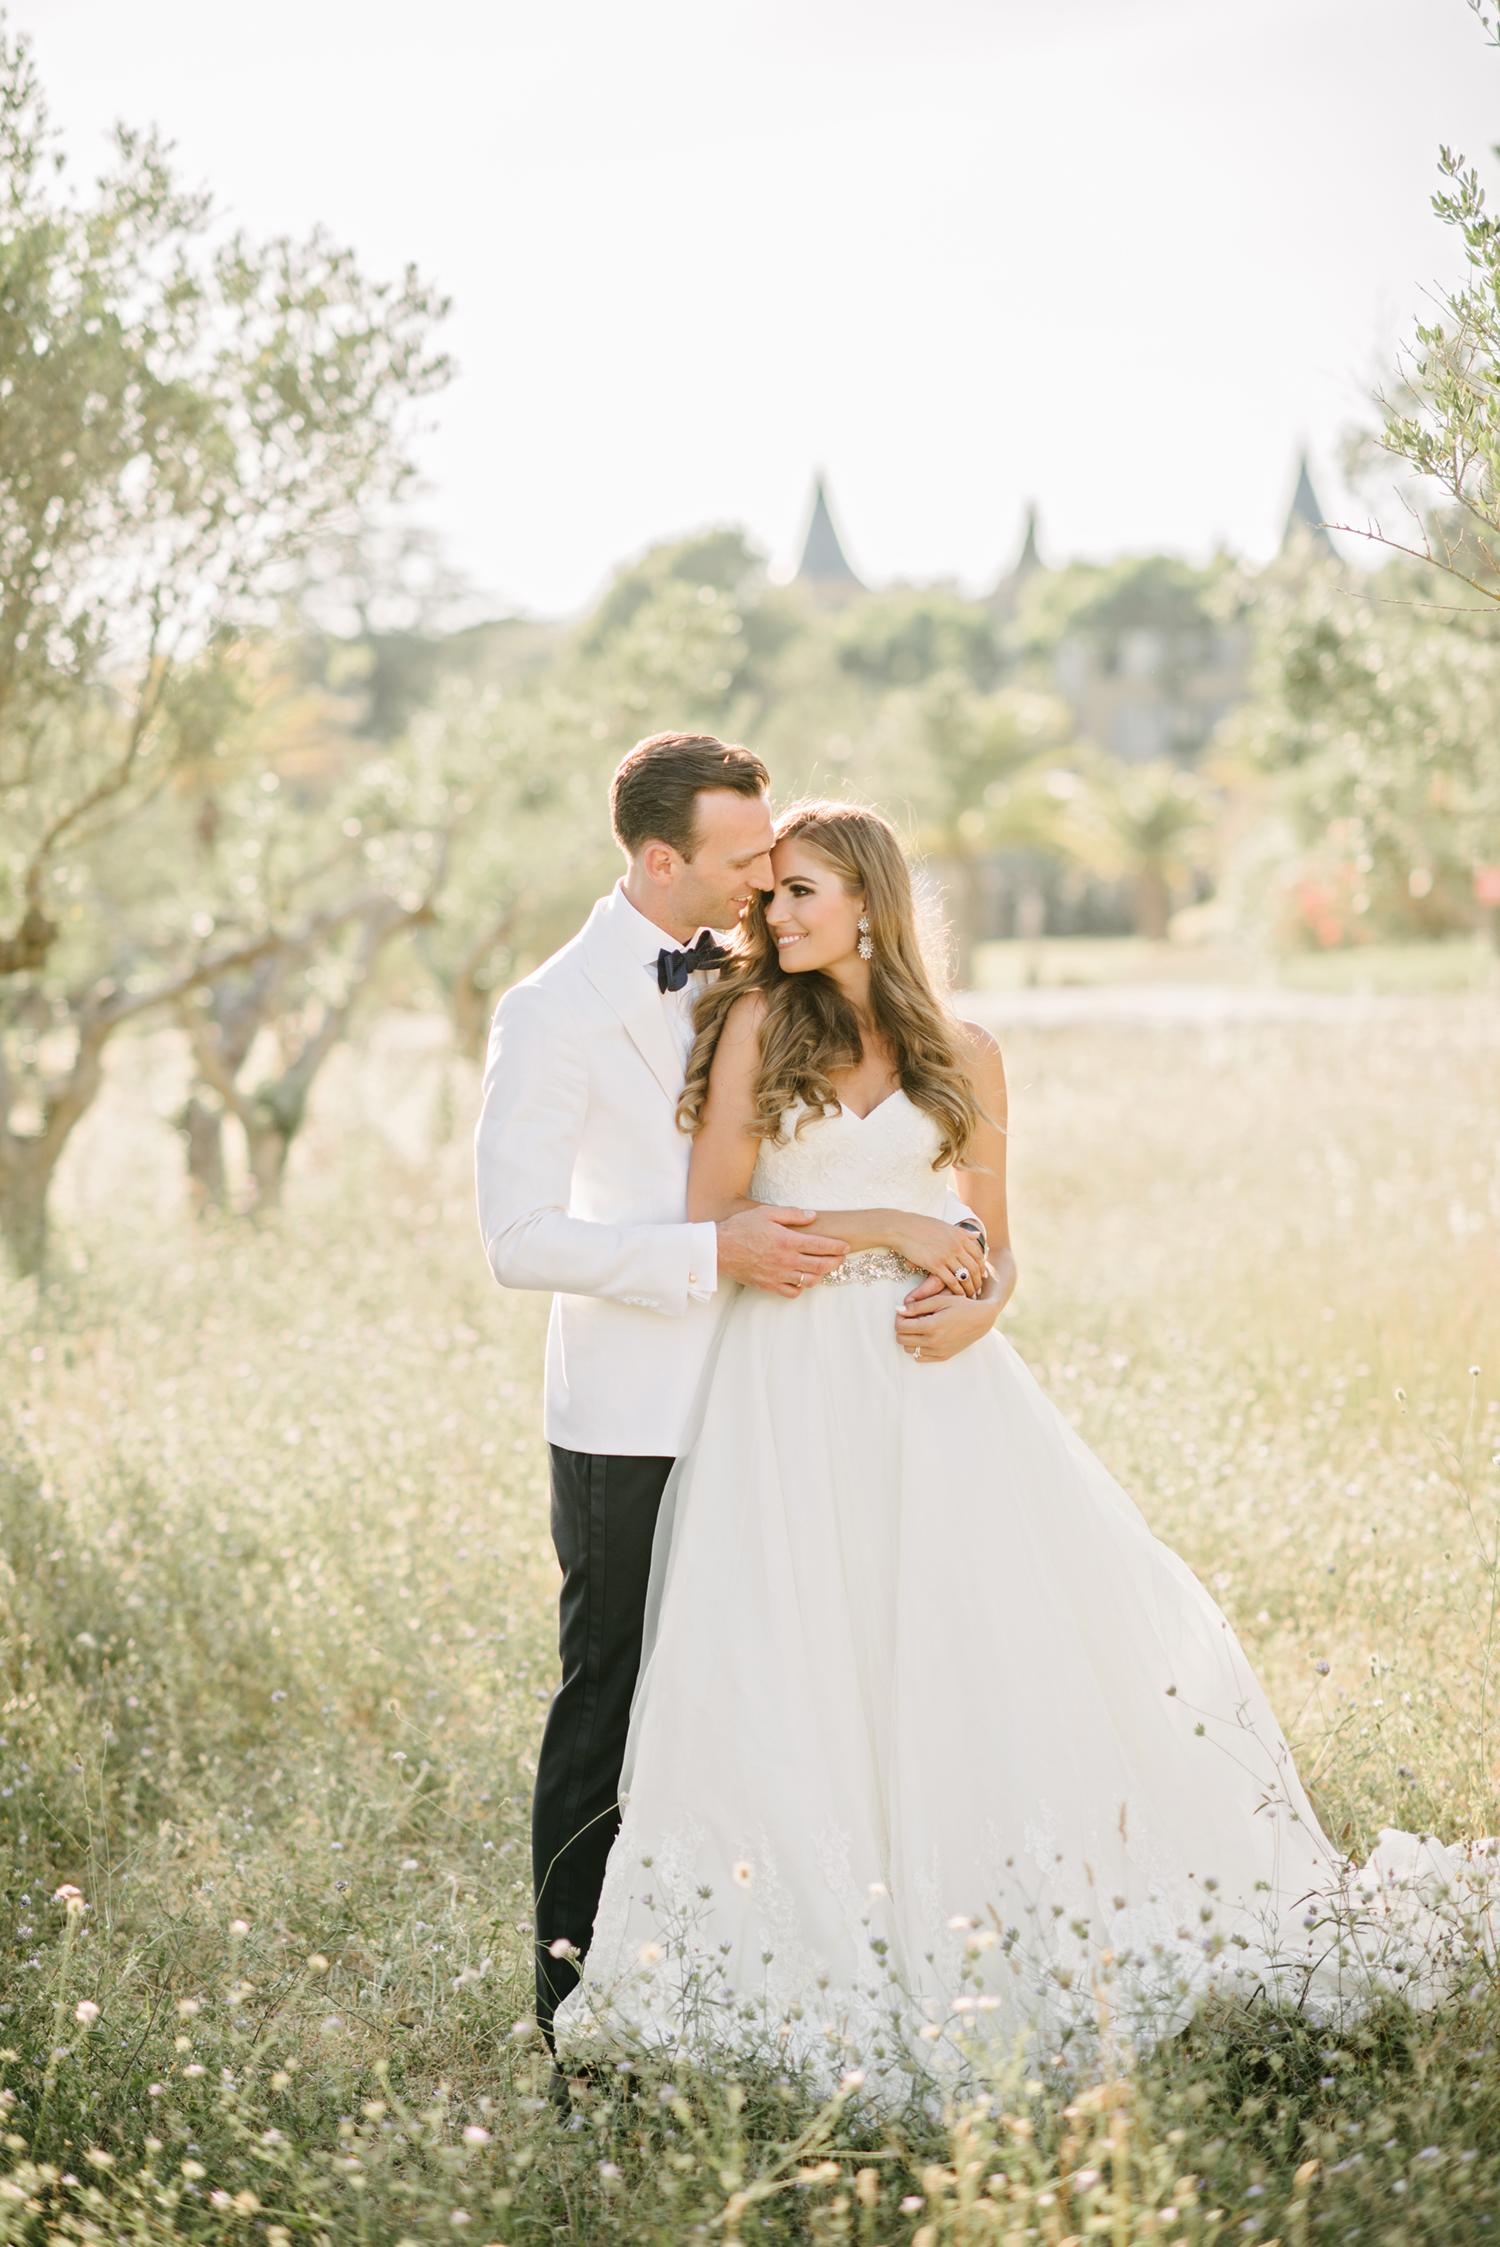 Chateau-Robernier-Wedding-Photographer-0128.jpg